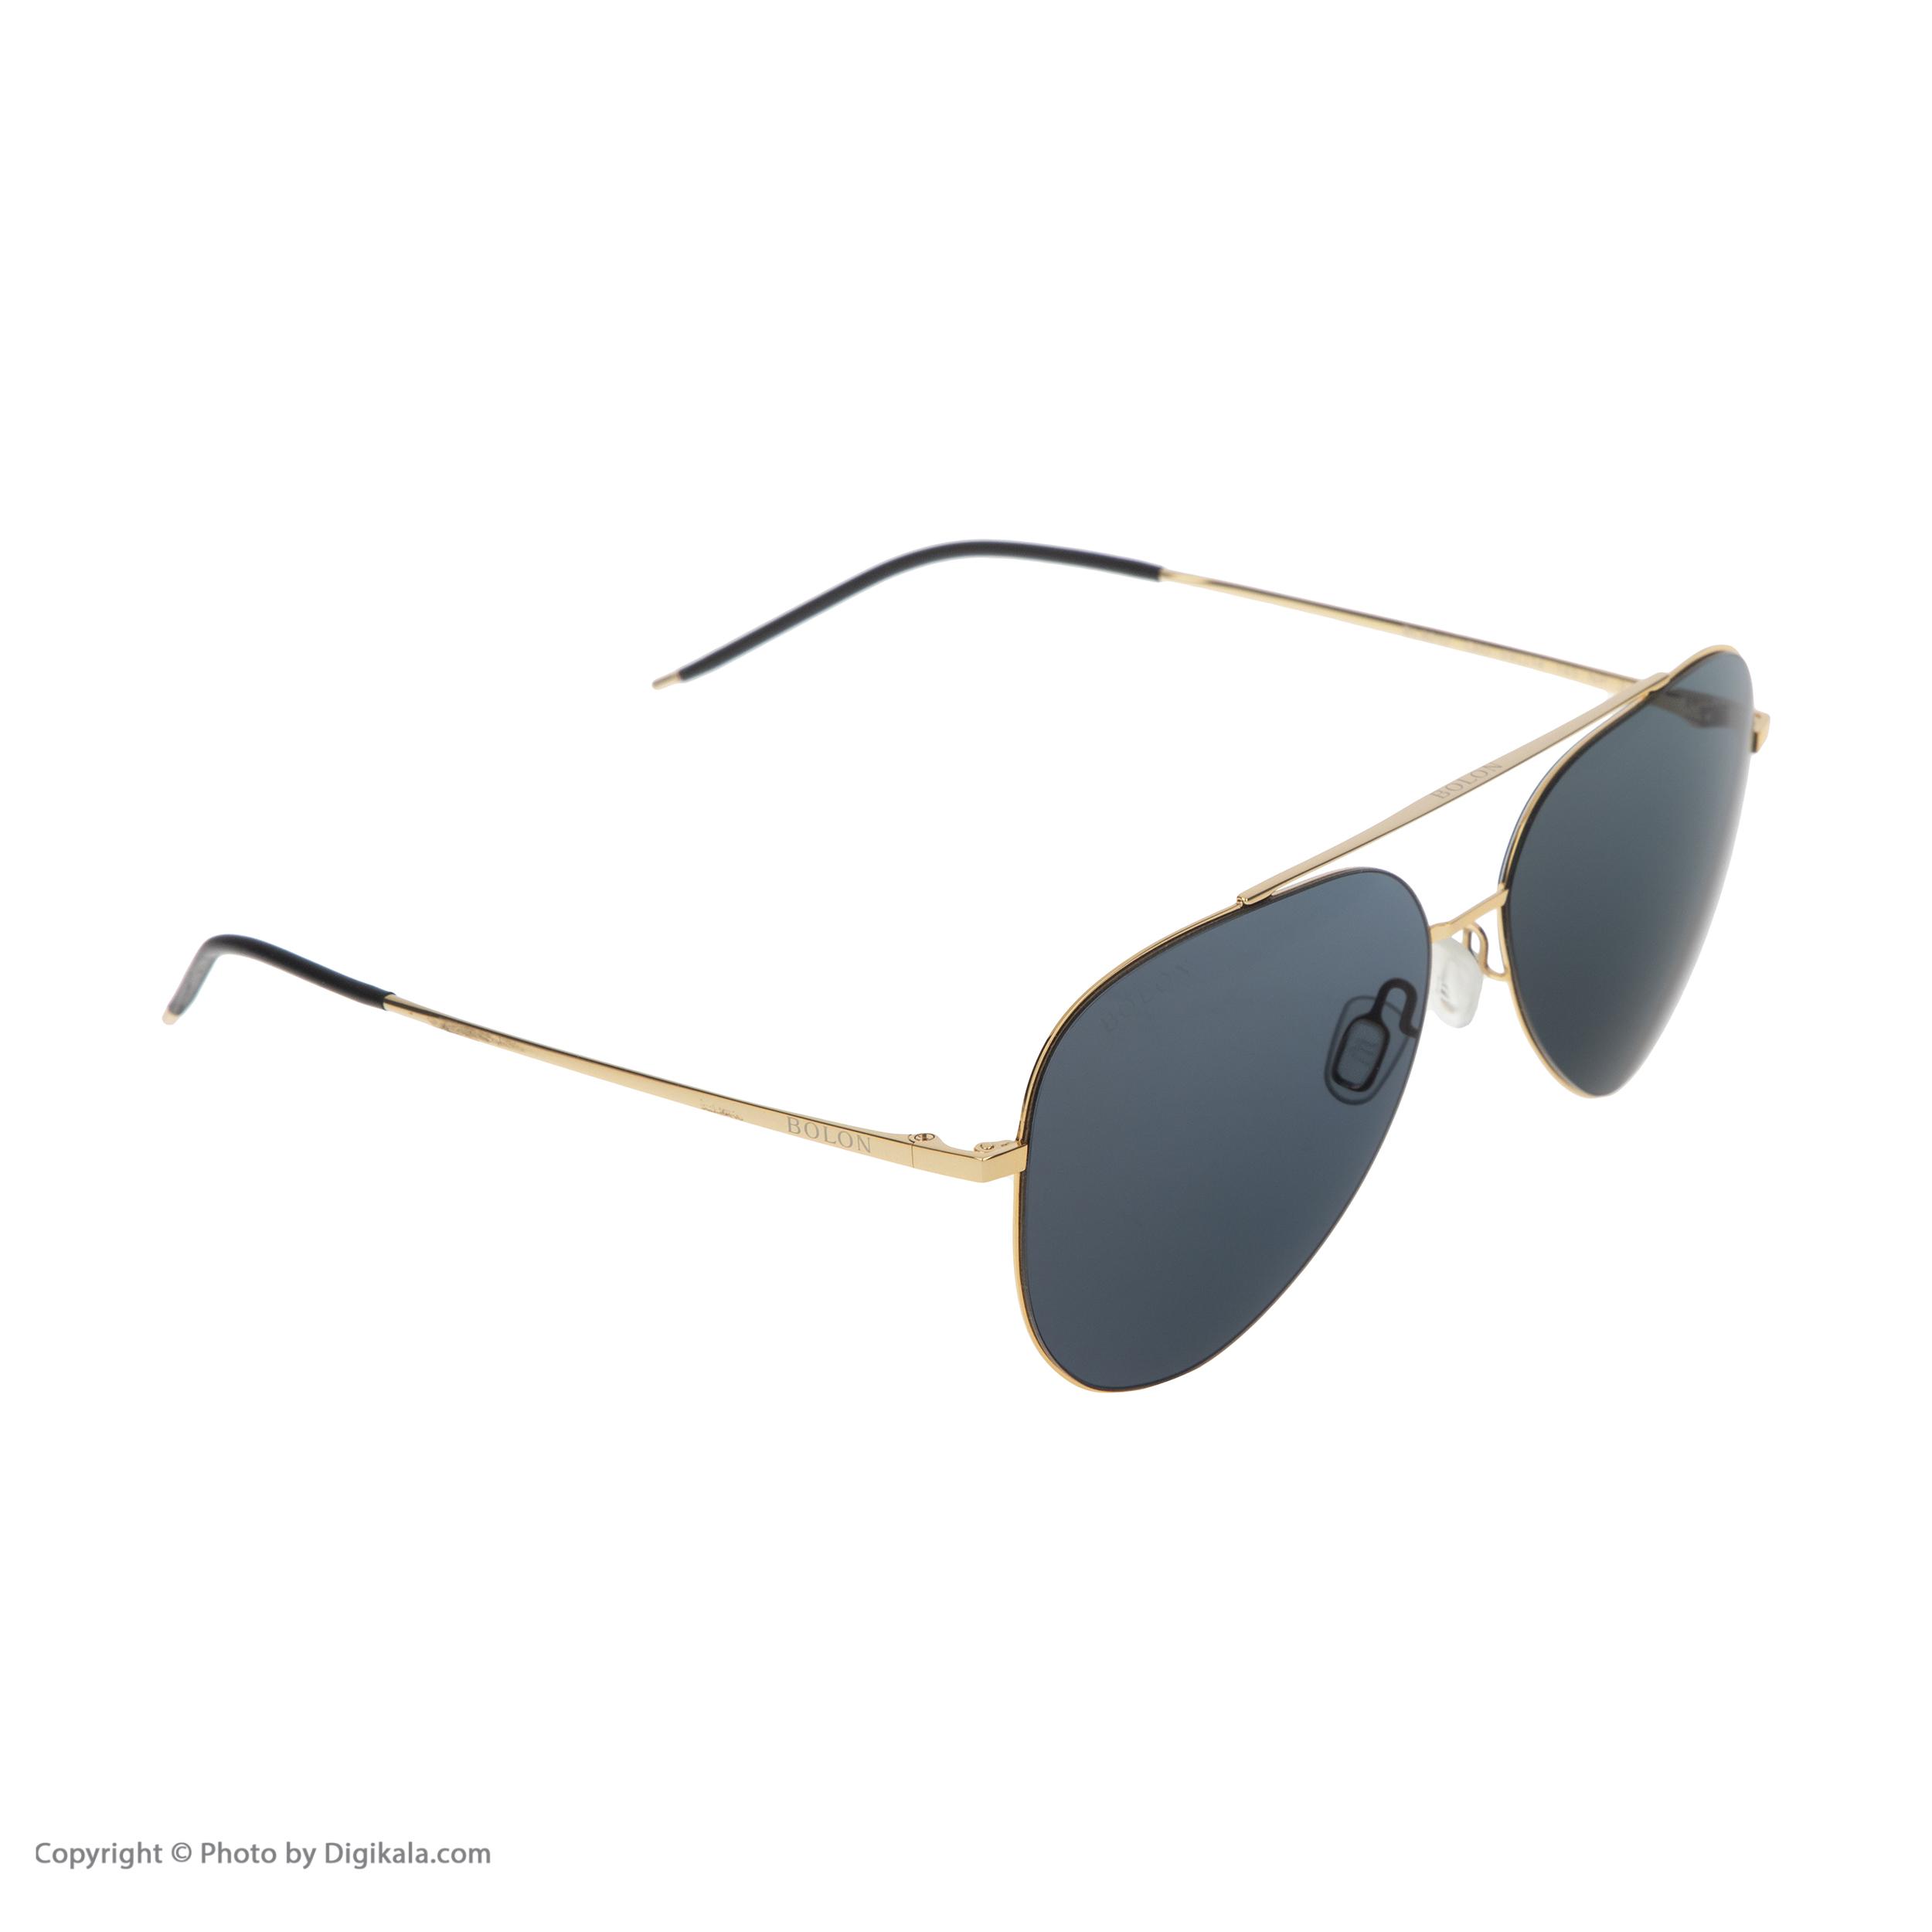 عینک آفتابی مردانه بولون مدل BL8010C60